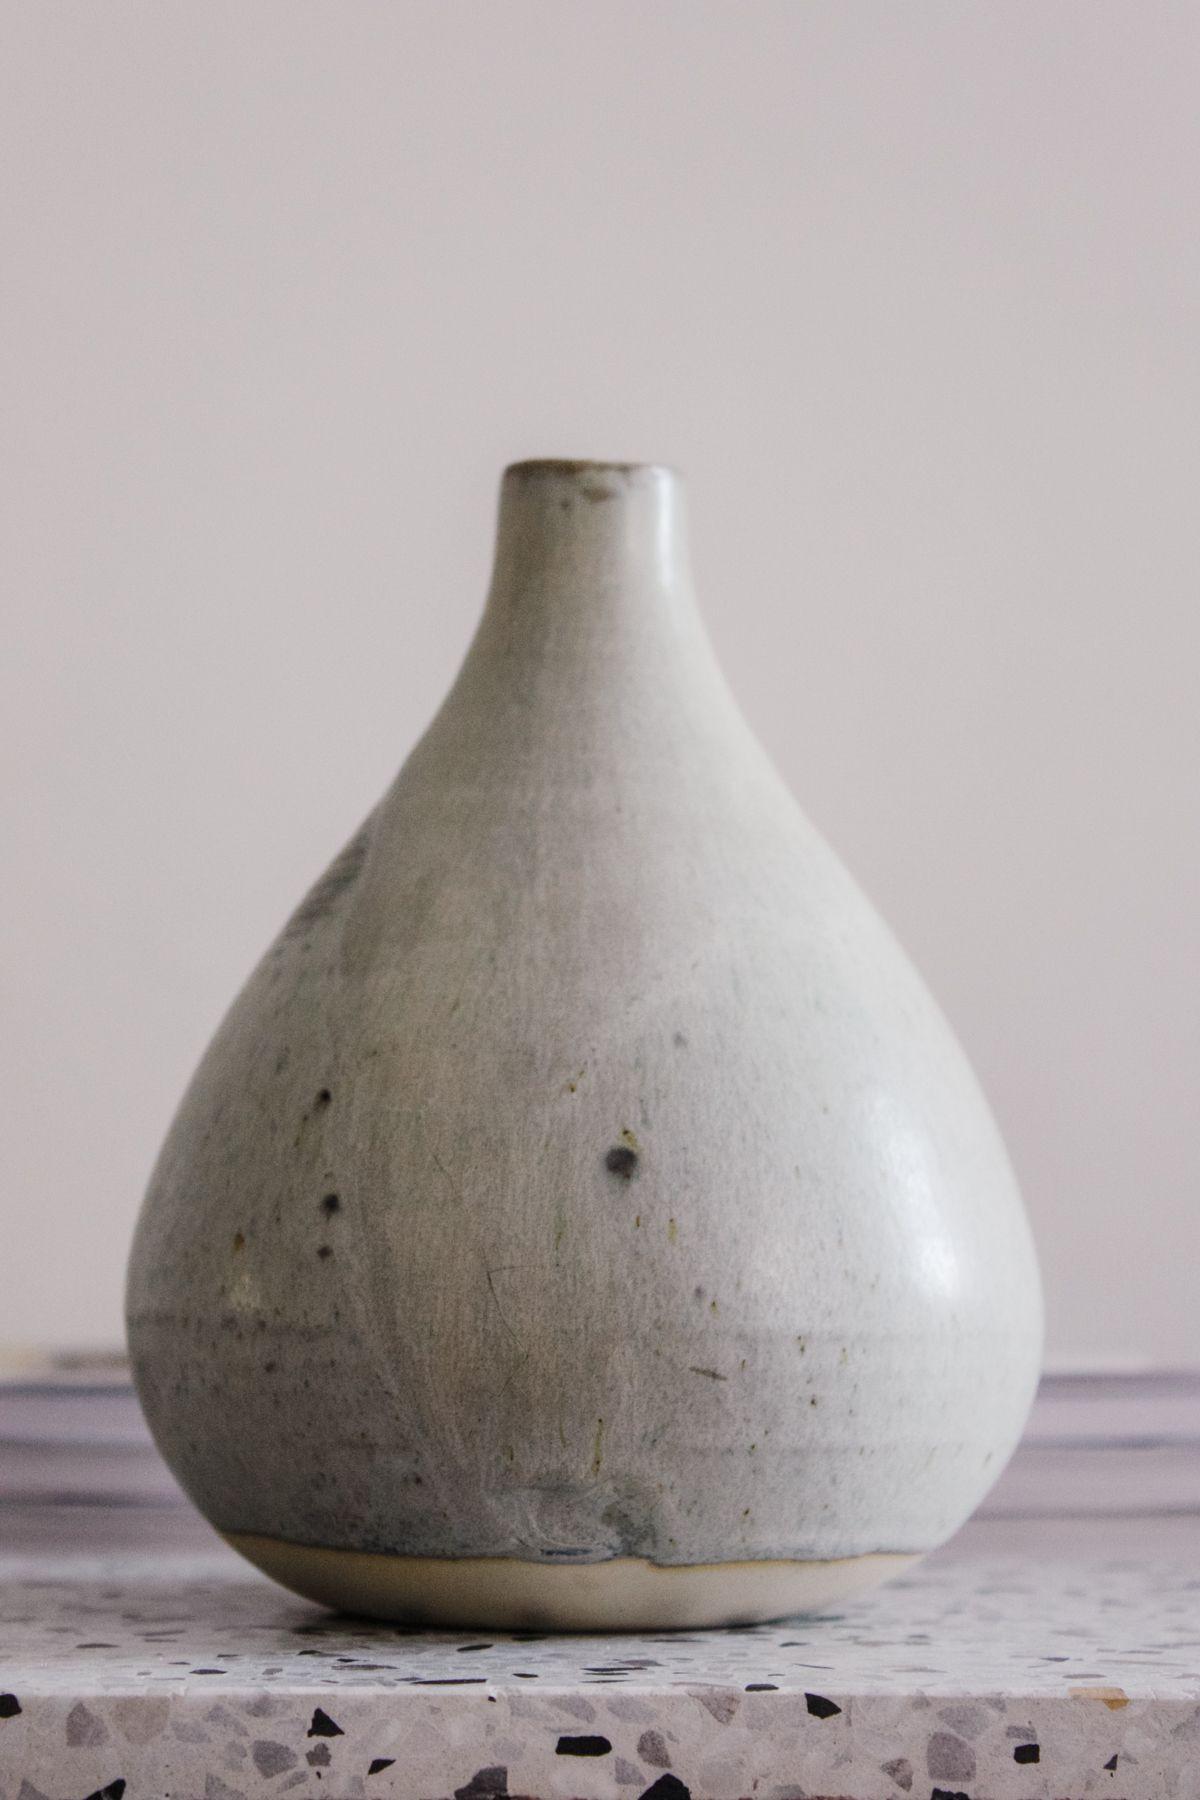 handmade ceramic vases uk of ceramics diesellerie keramikwihann grayish greyishblue handmade regarding ceramics diesellerie keramikwihann grayish greyishblue handmade handcrafted clay grey